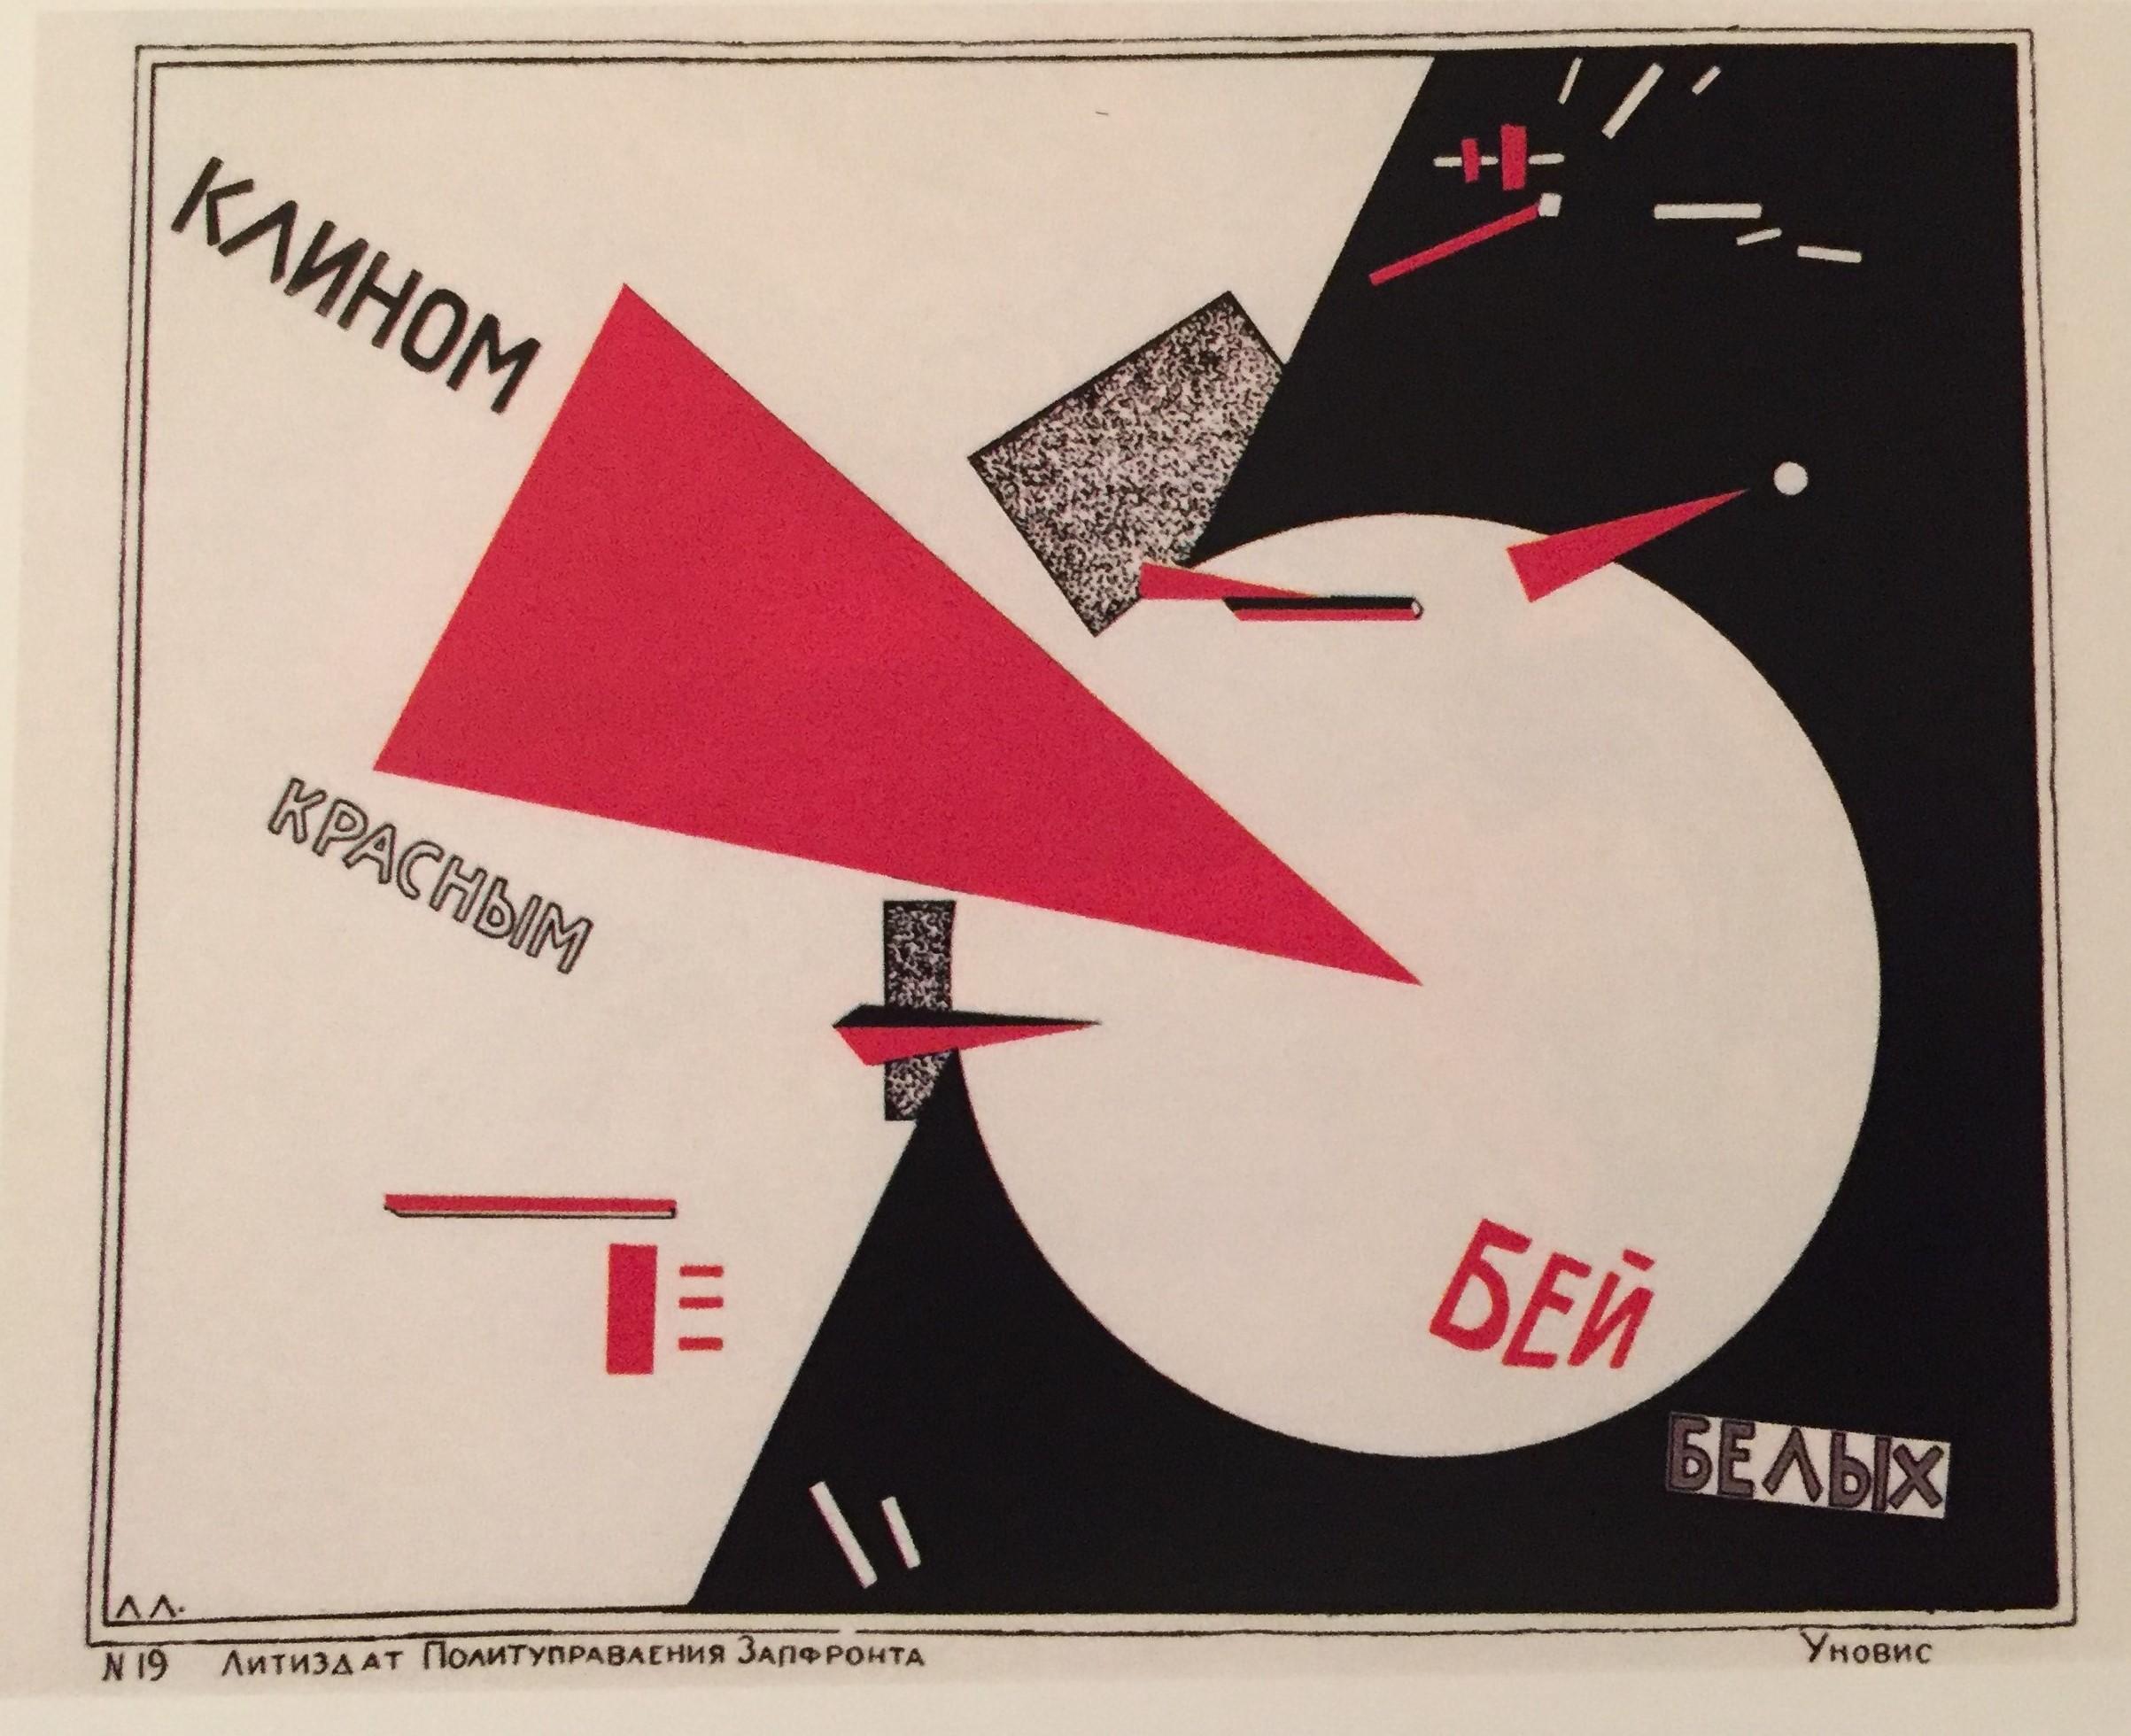 RA russian art (6)